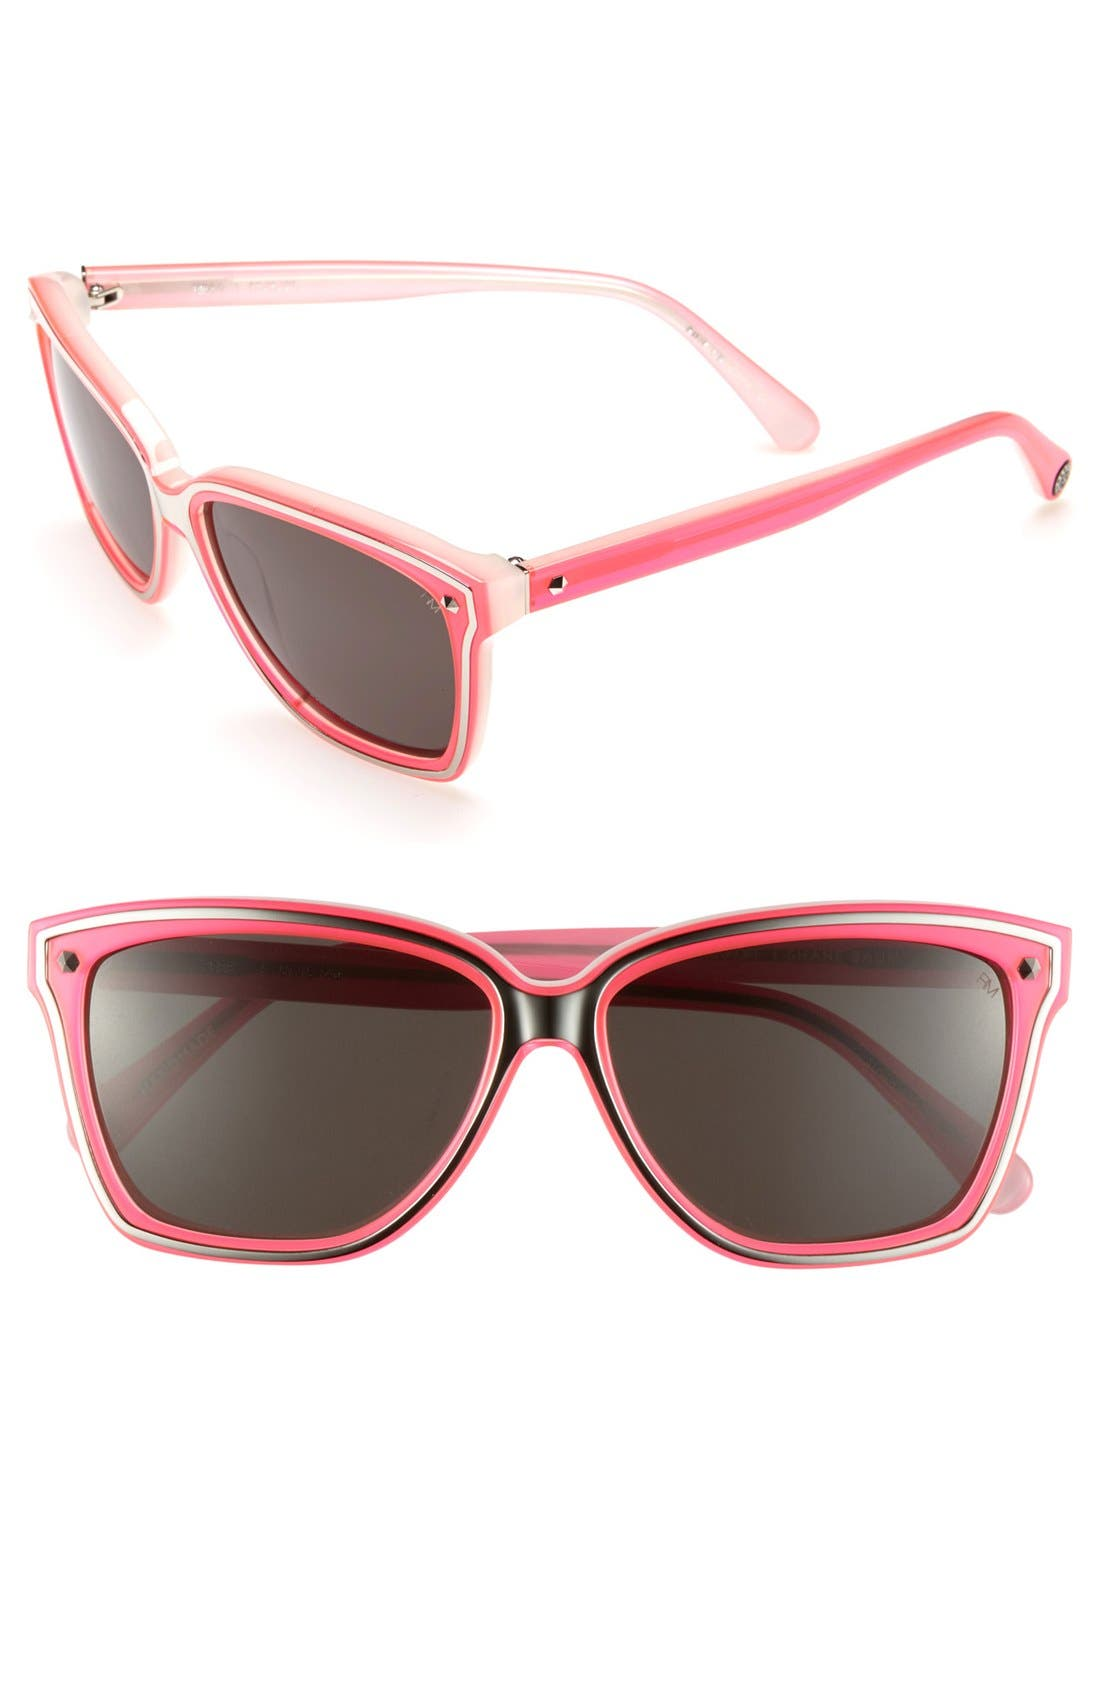 Main Image - Rebecca Minkoff 'Perry' 57mm Sunglasses